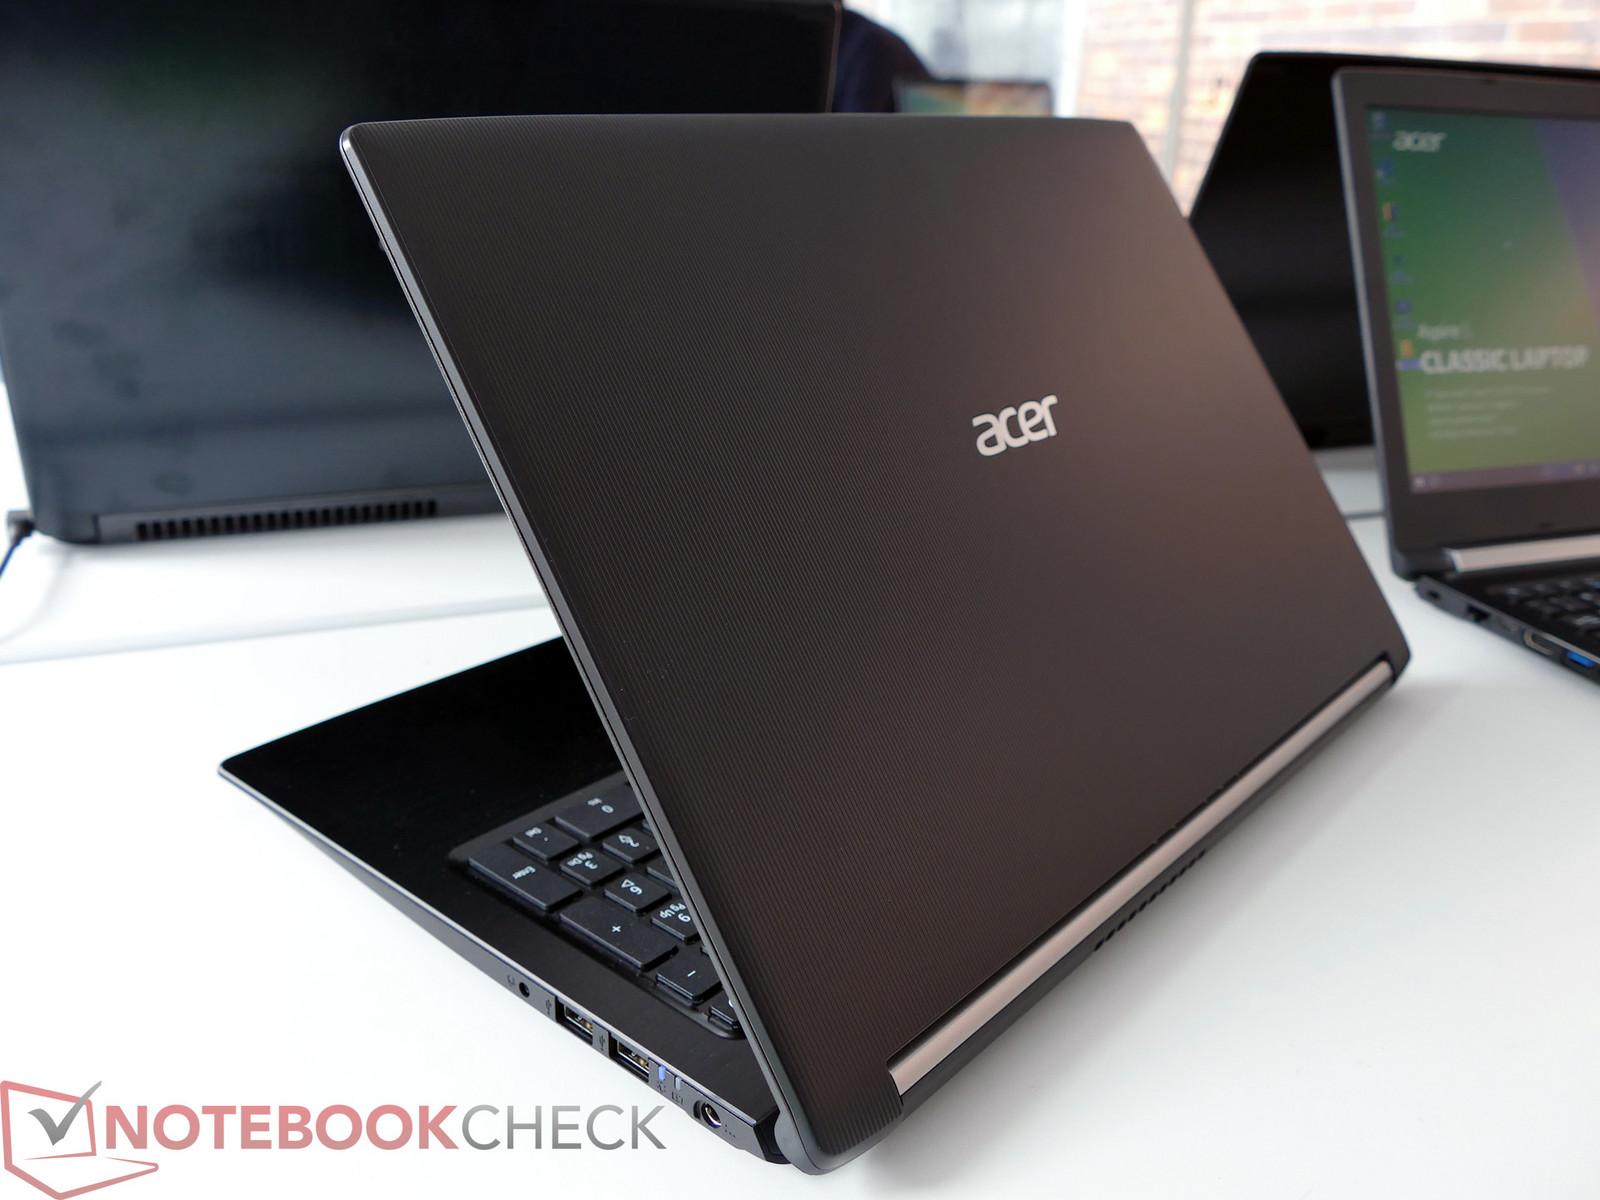 Acer Aspire 5 600 01